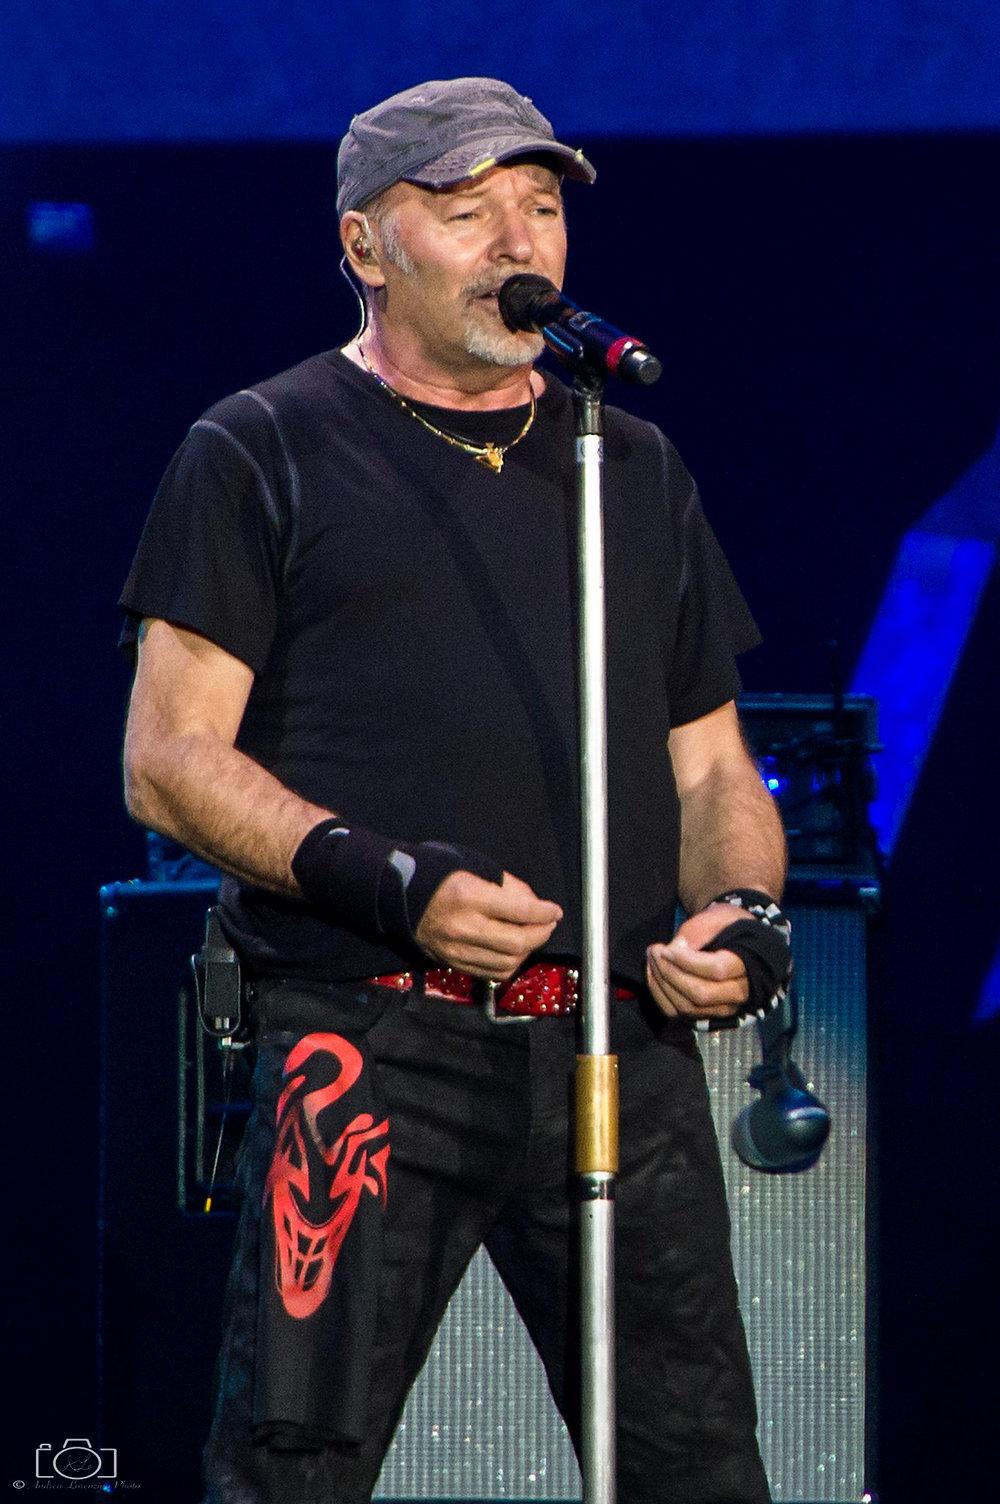 6-vasco-rossi-blasco-livekom-livekom015-live-spettacolo-rock-musica-concerto-concert-music.jpg